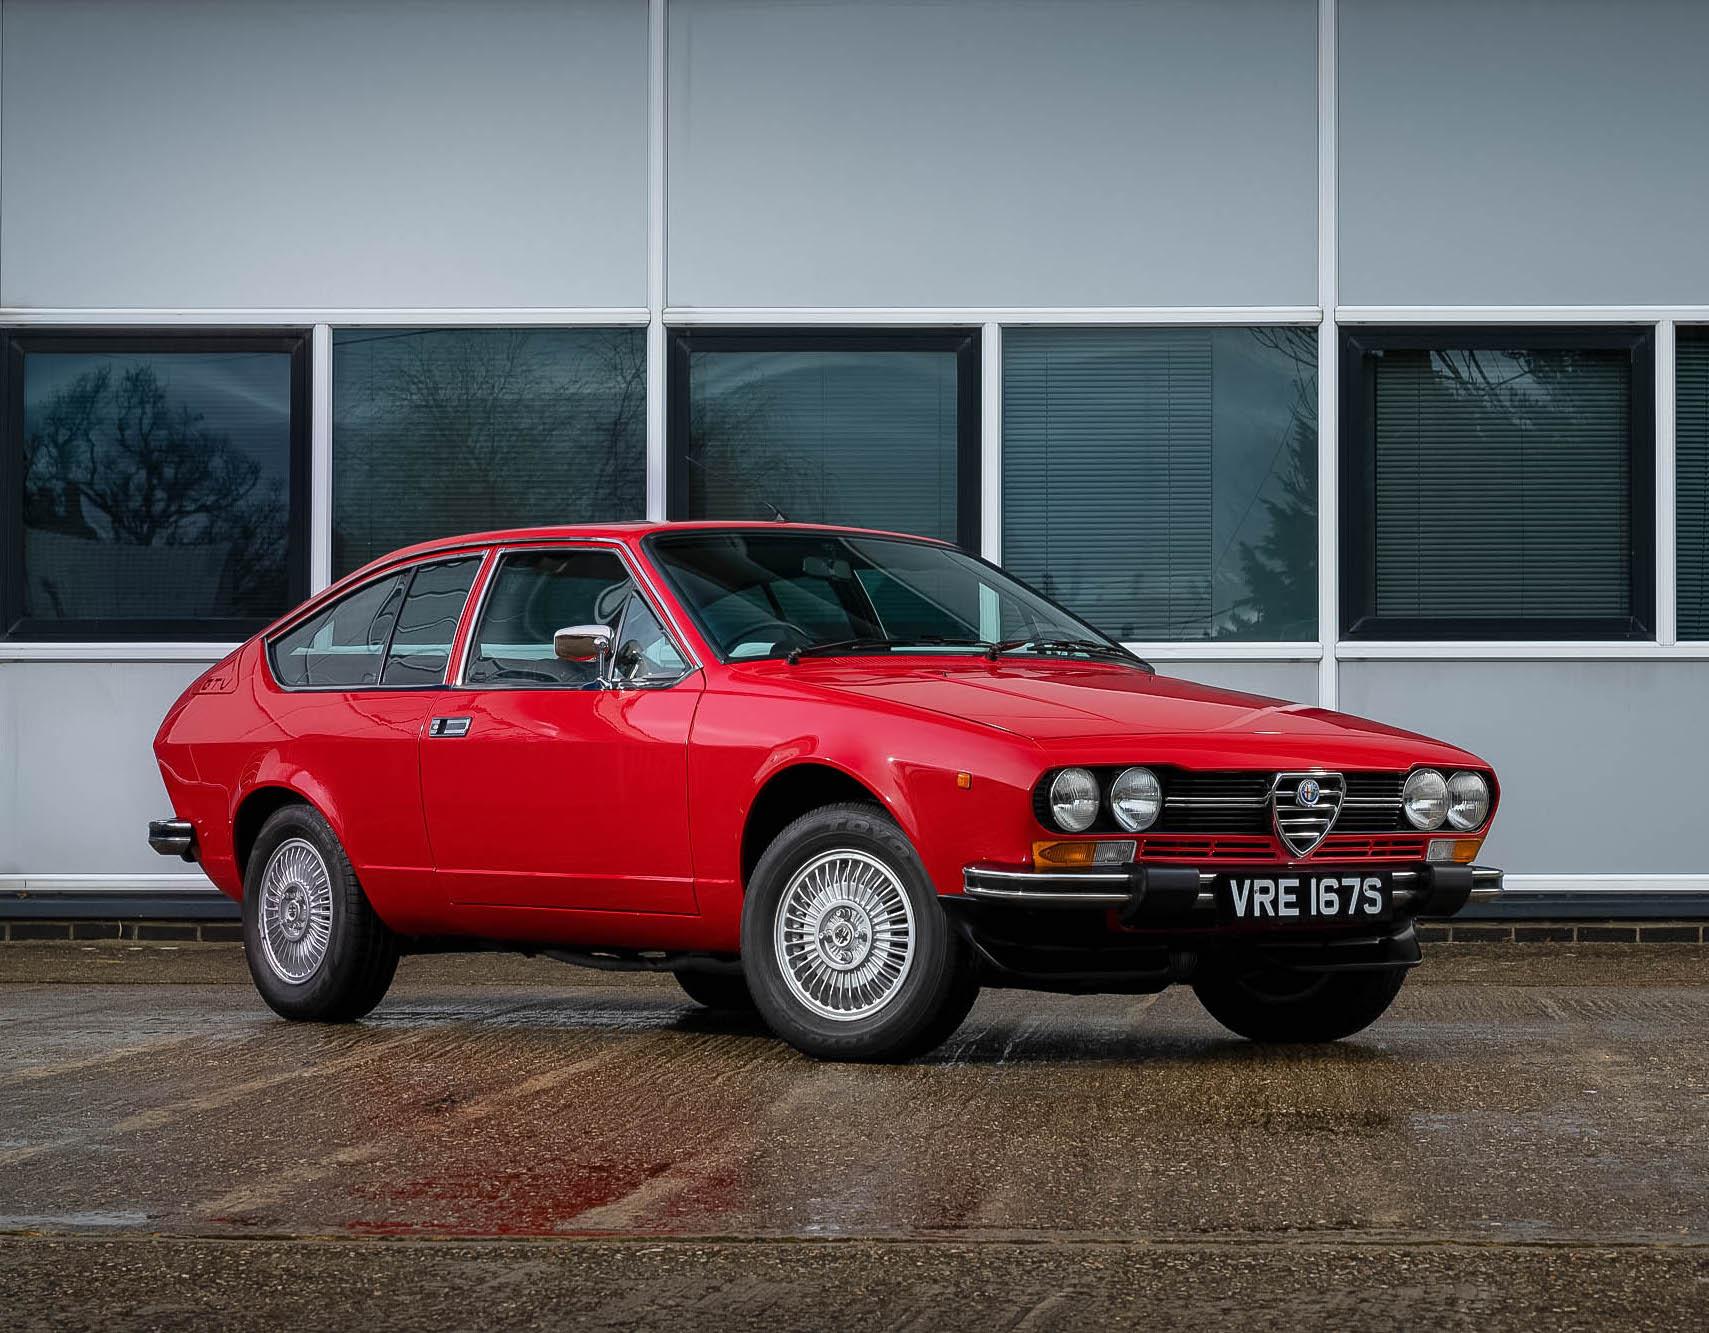 1977 ALFA ROMEO ALFETTA GTV